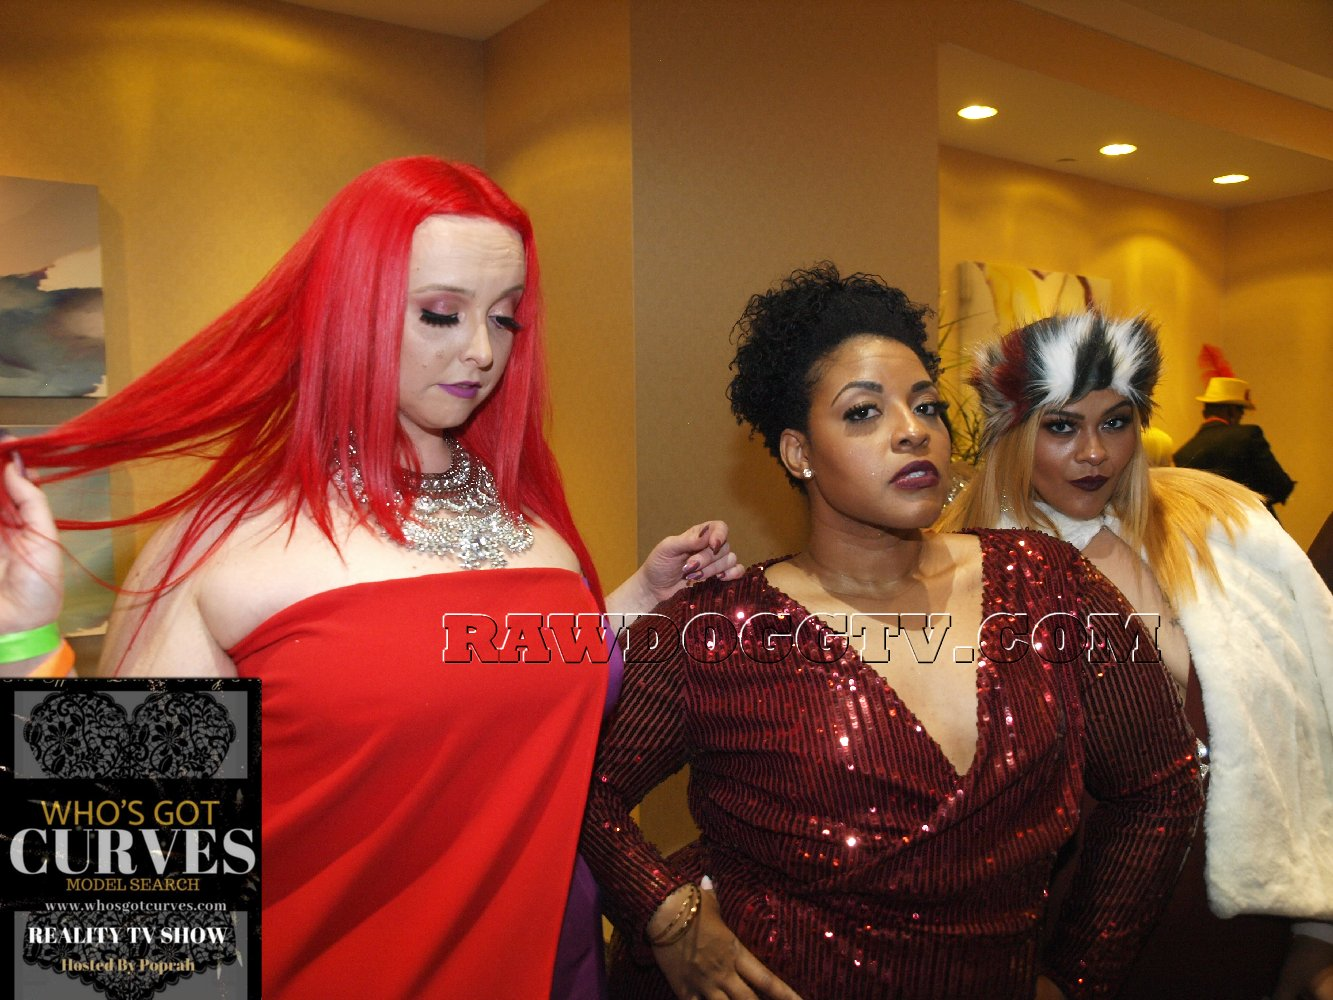 Whos Got Curves REALITY TV SHOW Atlanta Photos-HOLLYWOOD SOUTH PRESENTS httpsrawdoggtv (8)